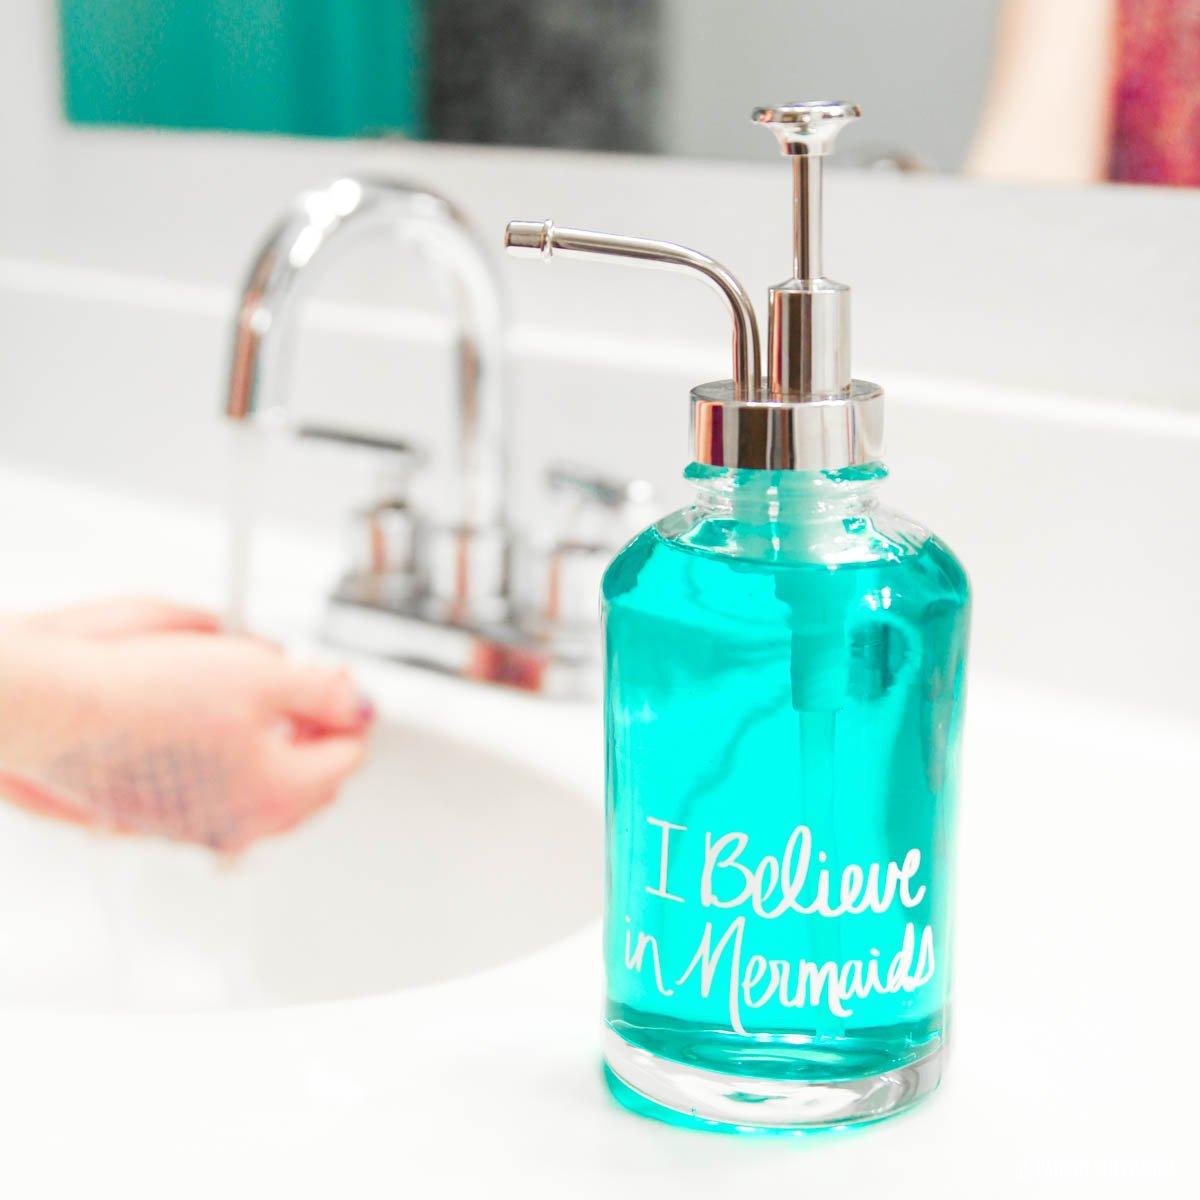 Mermaid Bathroom Ideas: Make this DIY hand-lettered soap pump via @PagingSupermom